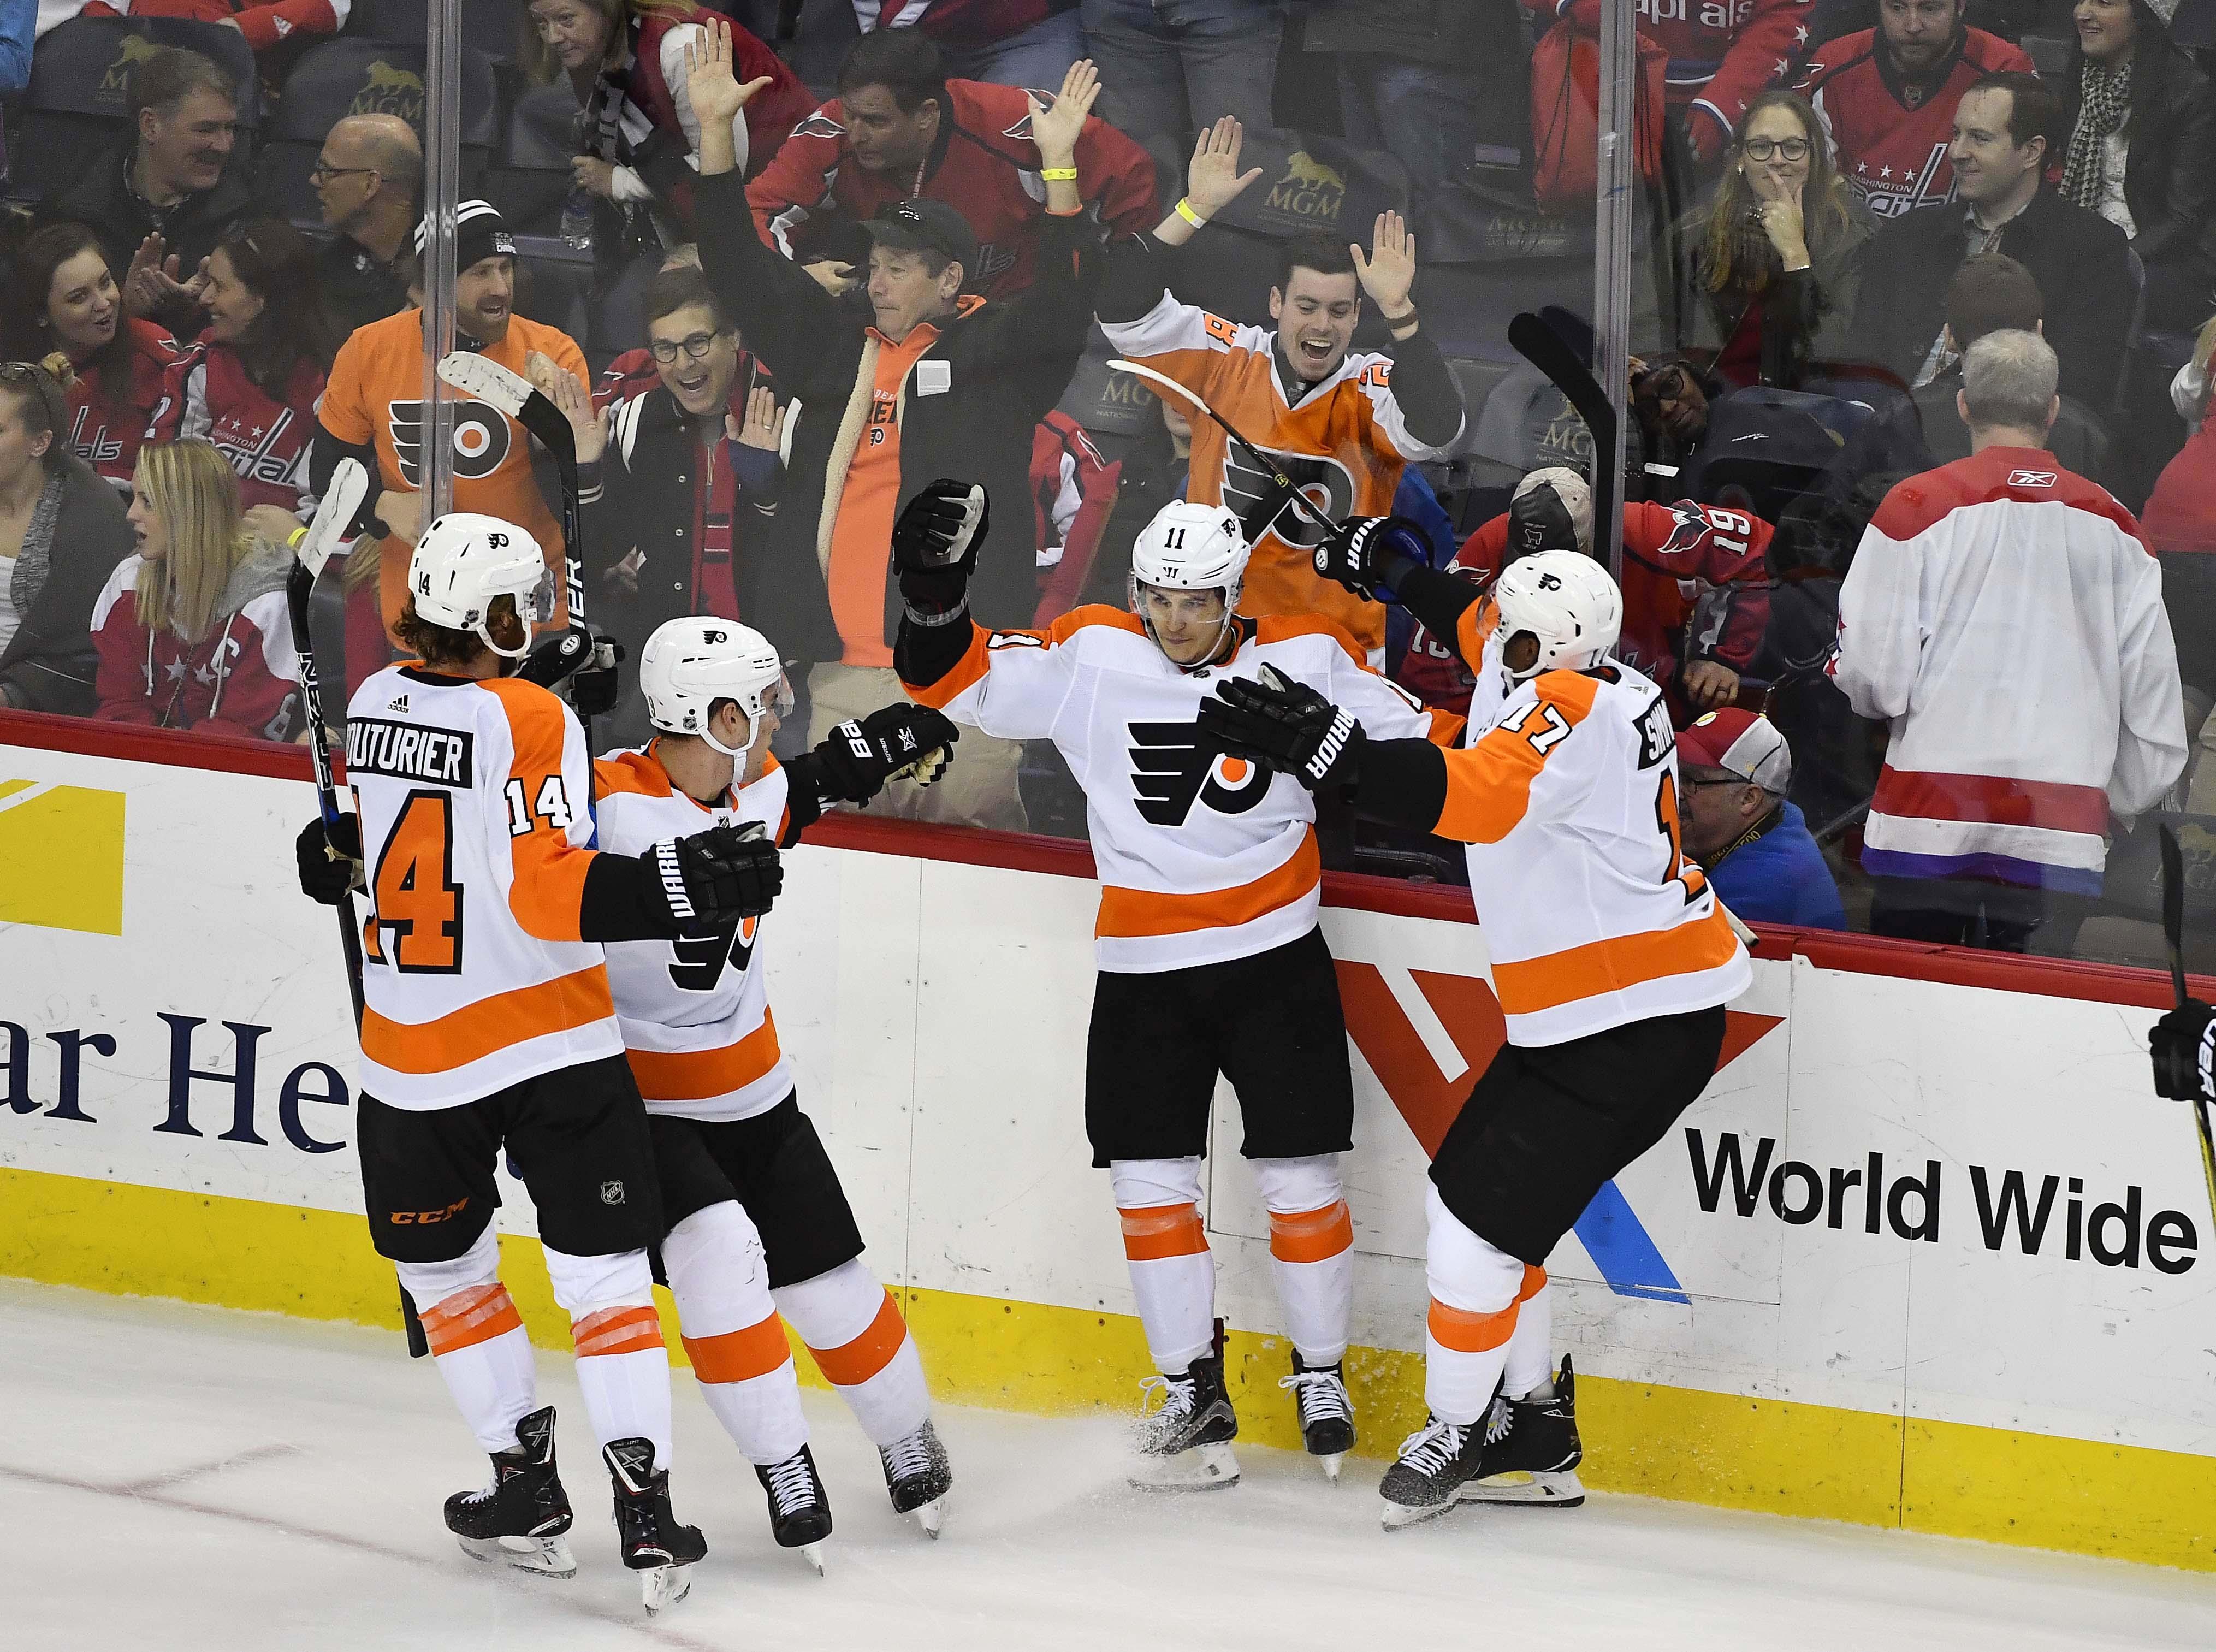 Five takeaways from the Flyers' 2-1 win in OT over Washington